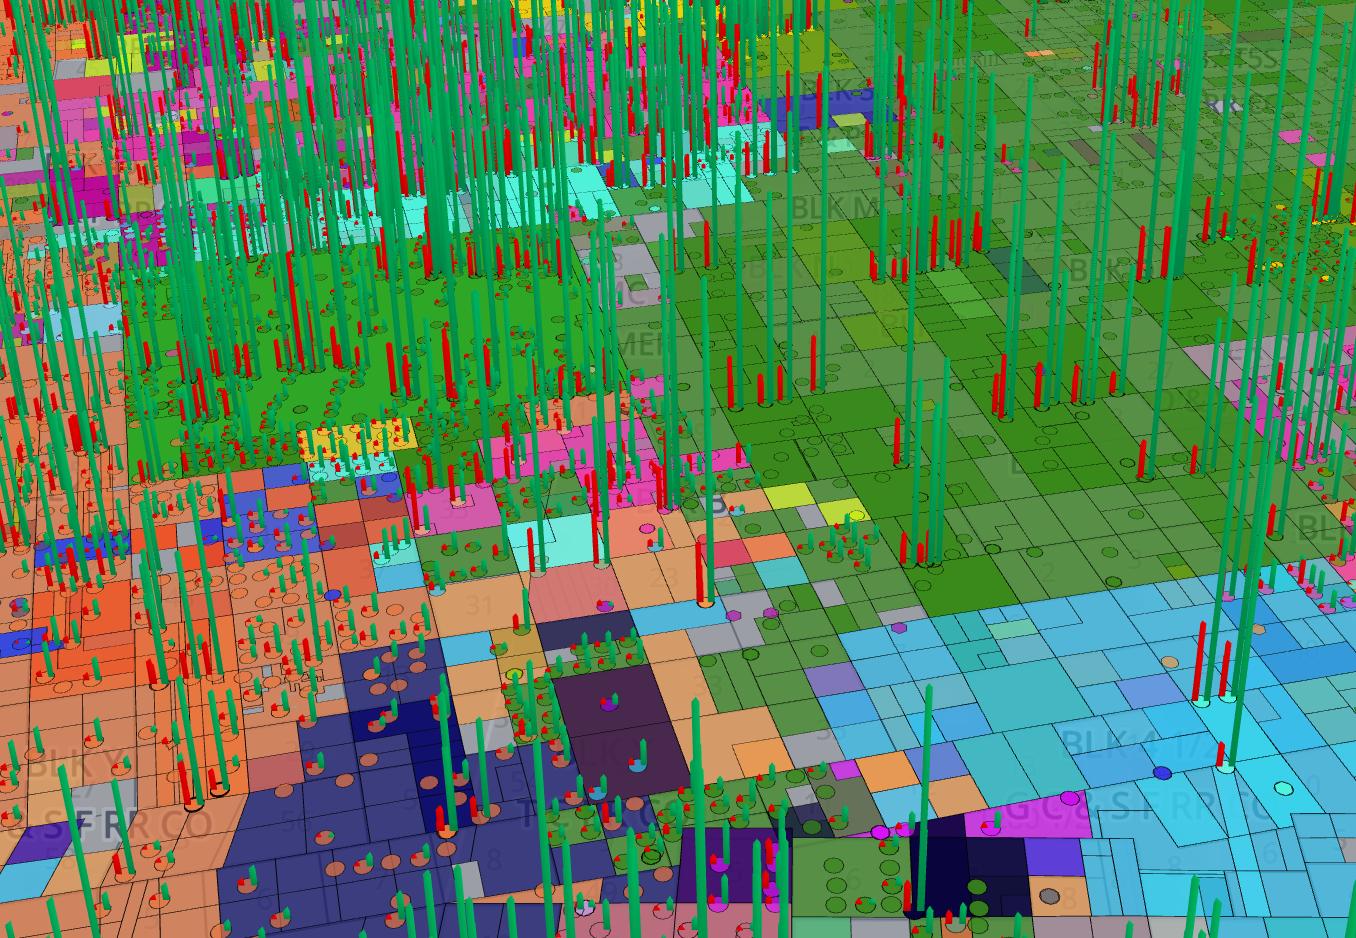 Atla by Oseberg offers Texas Permian data